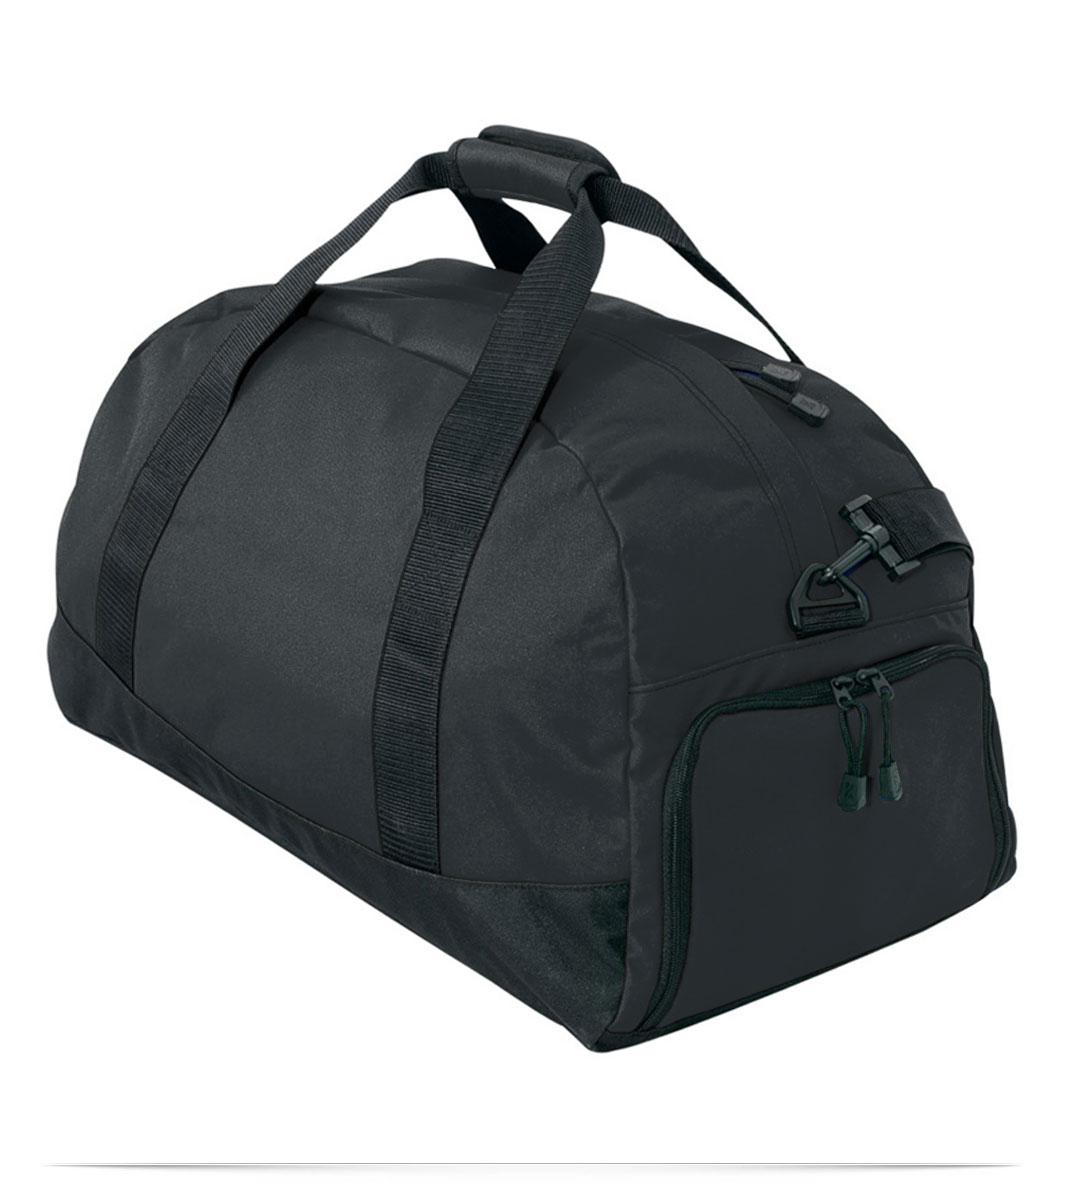 Customized Large Duffel Bag